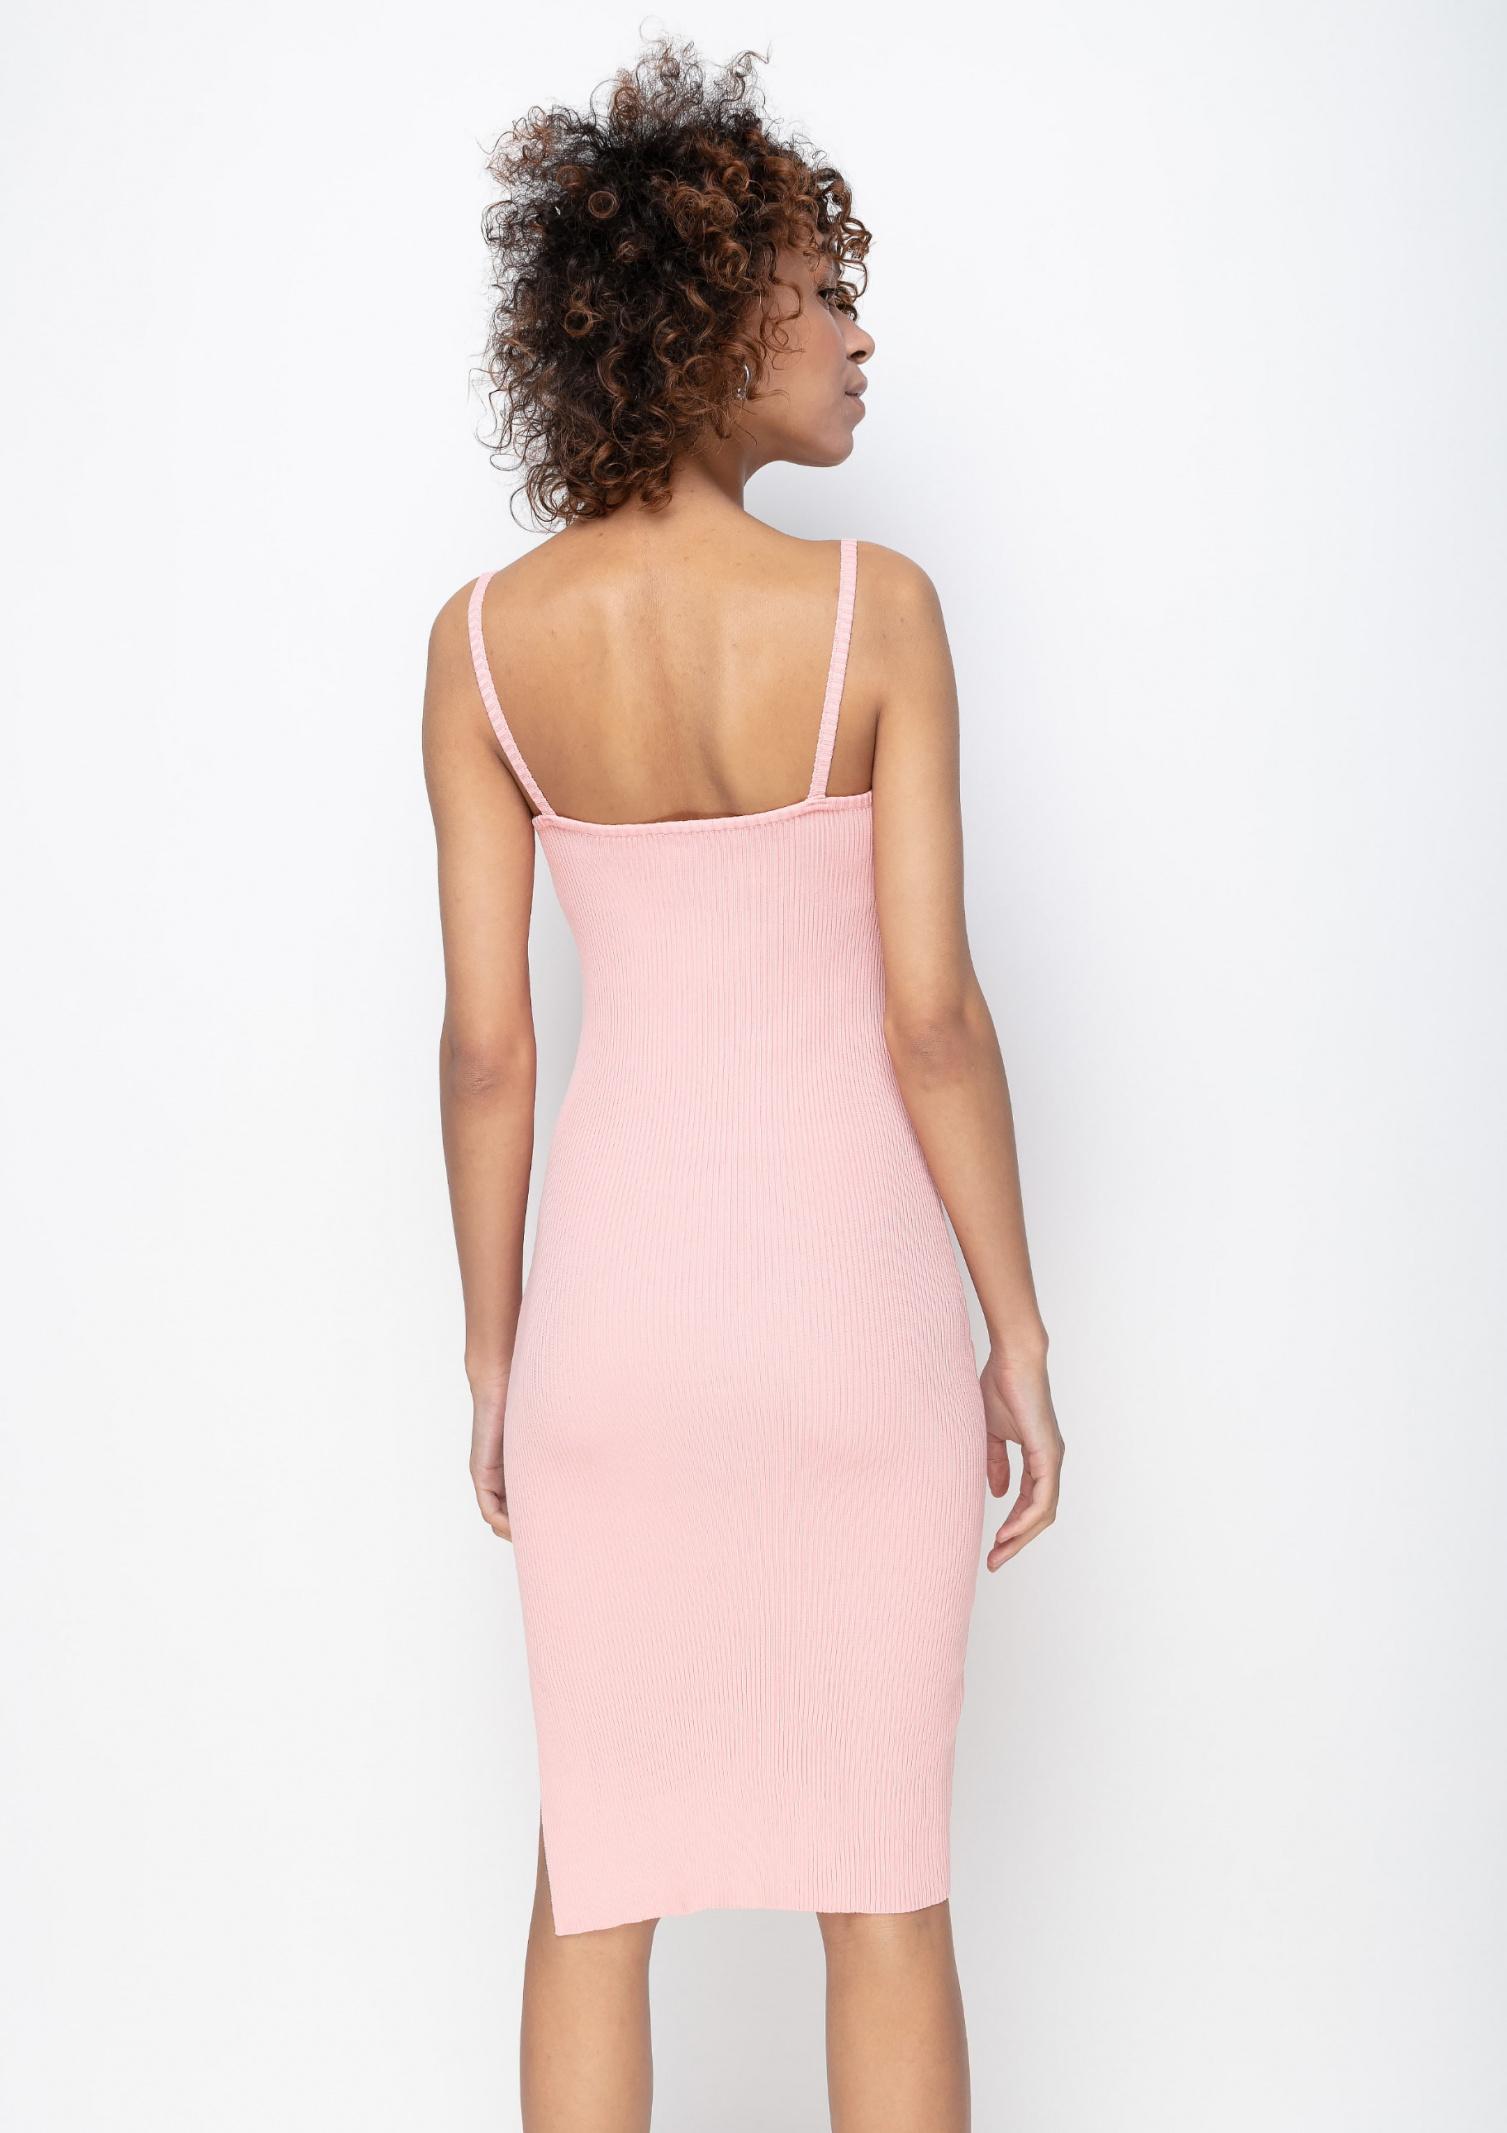 Samange Сукня жіночі модель 900-GIG_186 , 2017